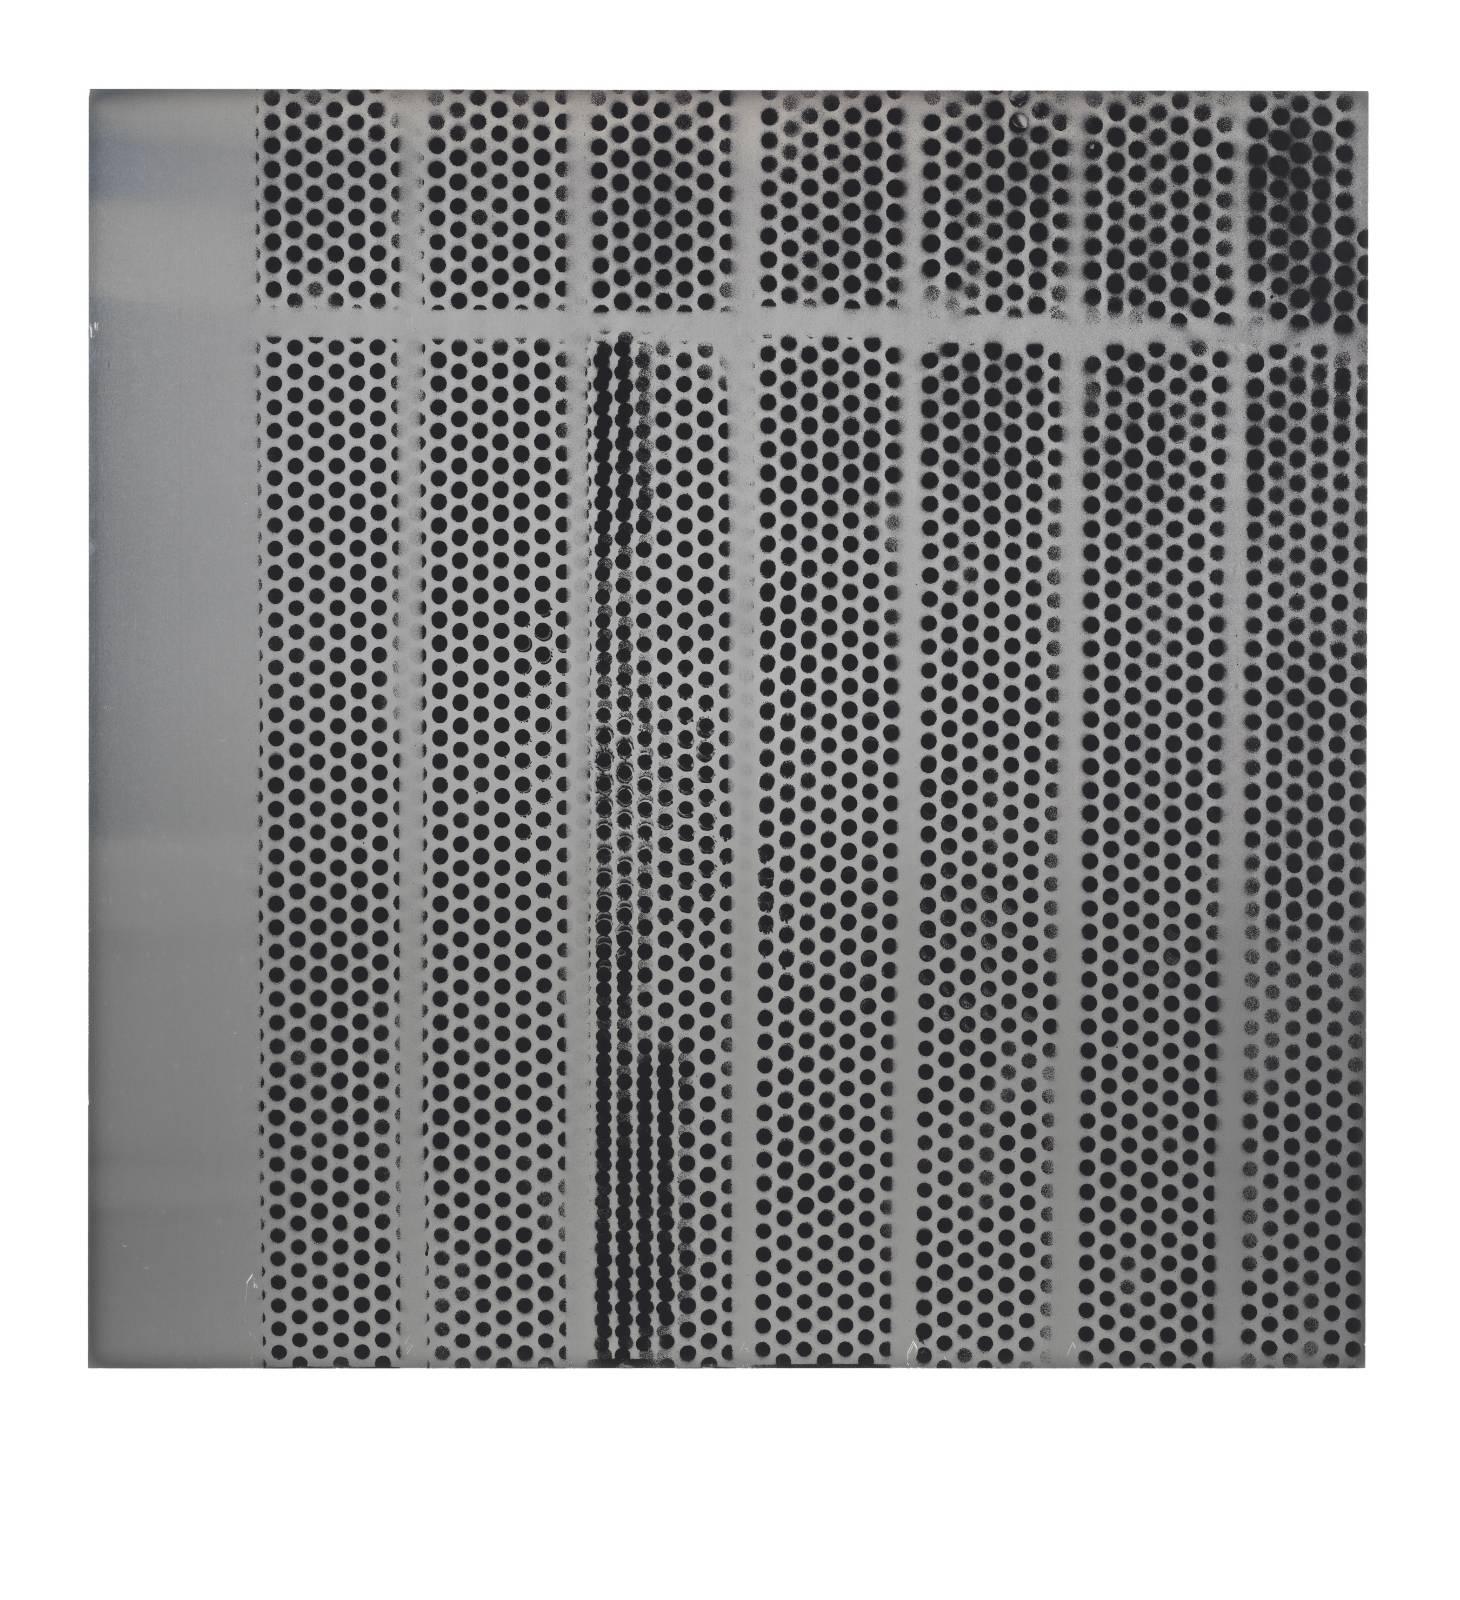 "STAIN : 55°36'20.8""N 13°00'17.1""E, 2016, spraypaint on aluminium, 81,3 x 81,3 cm"